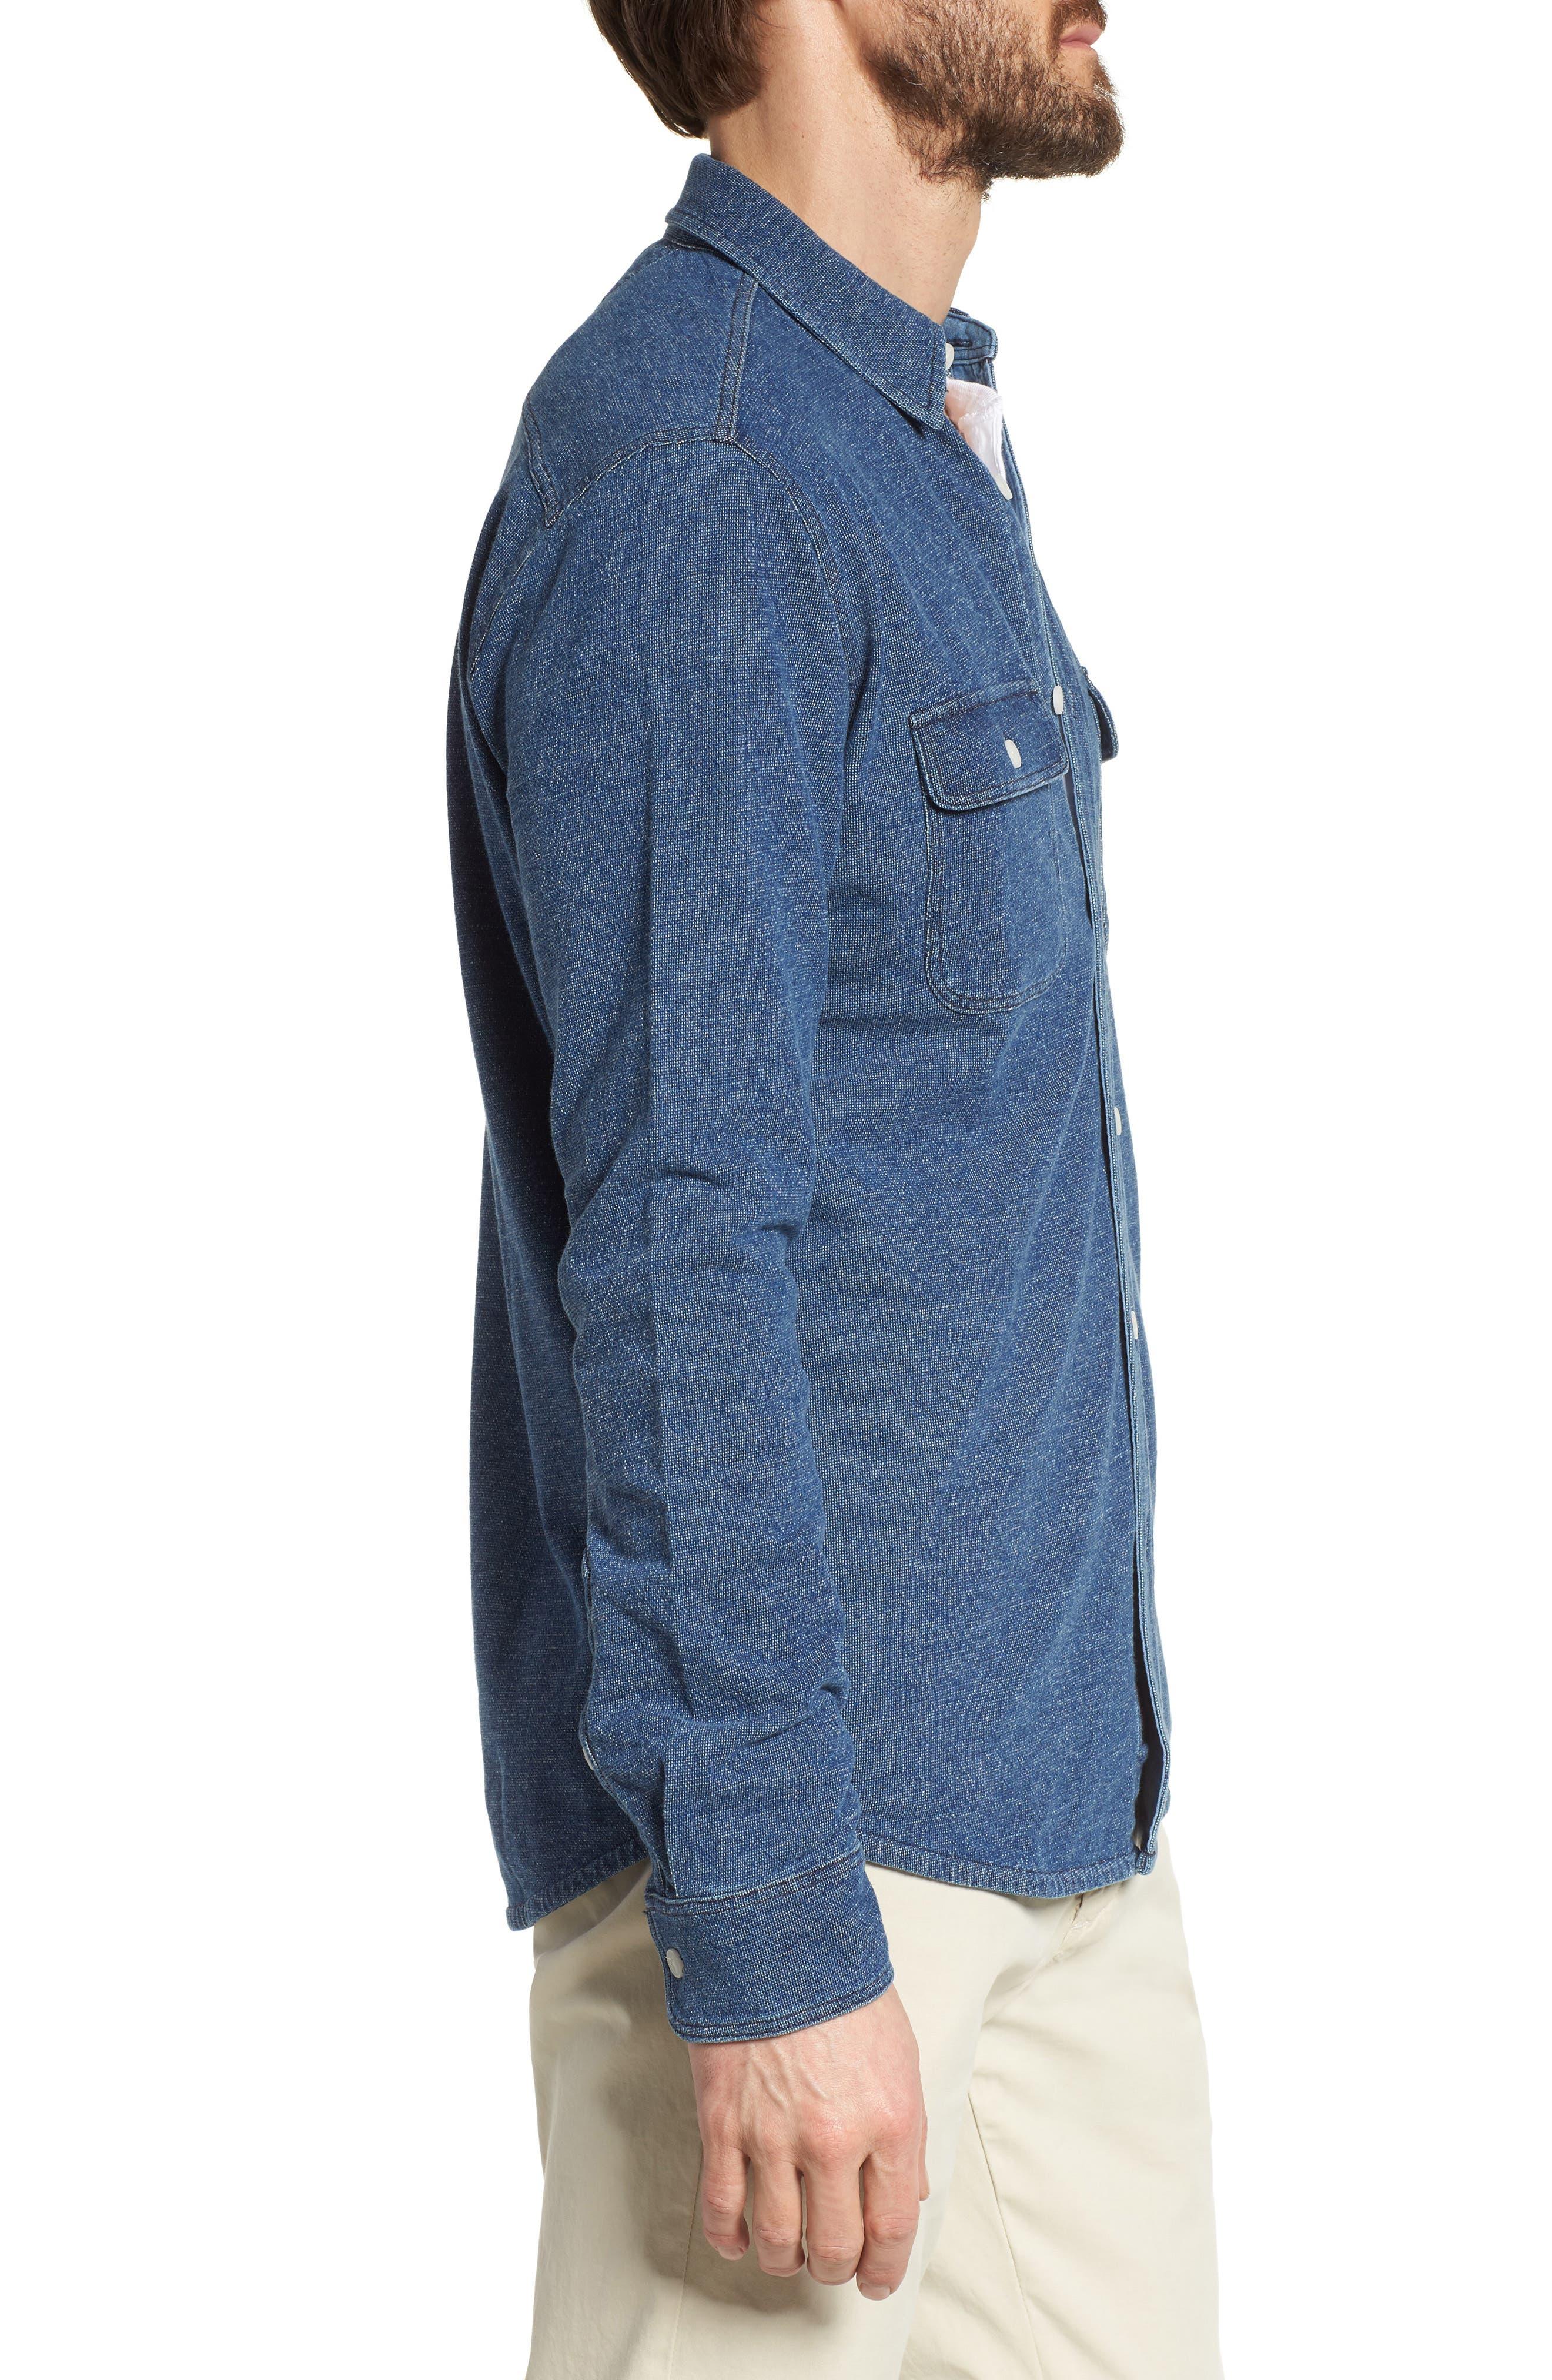 Belmar Chambray Knit Sport Shirt,                             Alternate thumbnail 3, color,                             Medium Wash Indigo